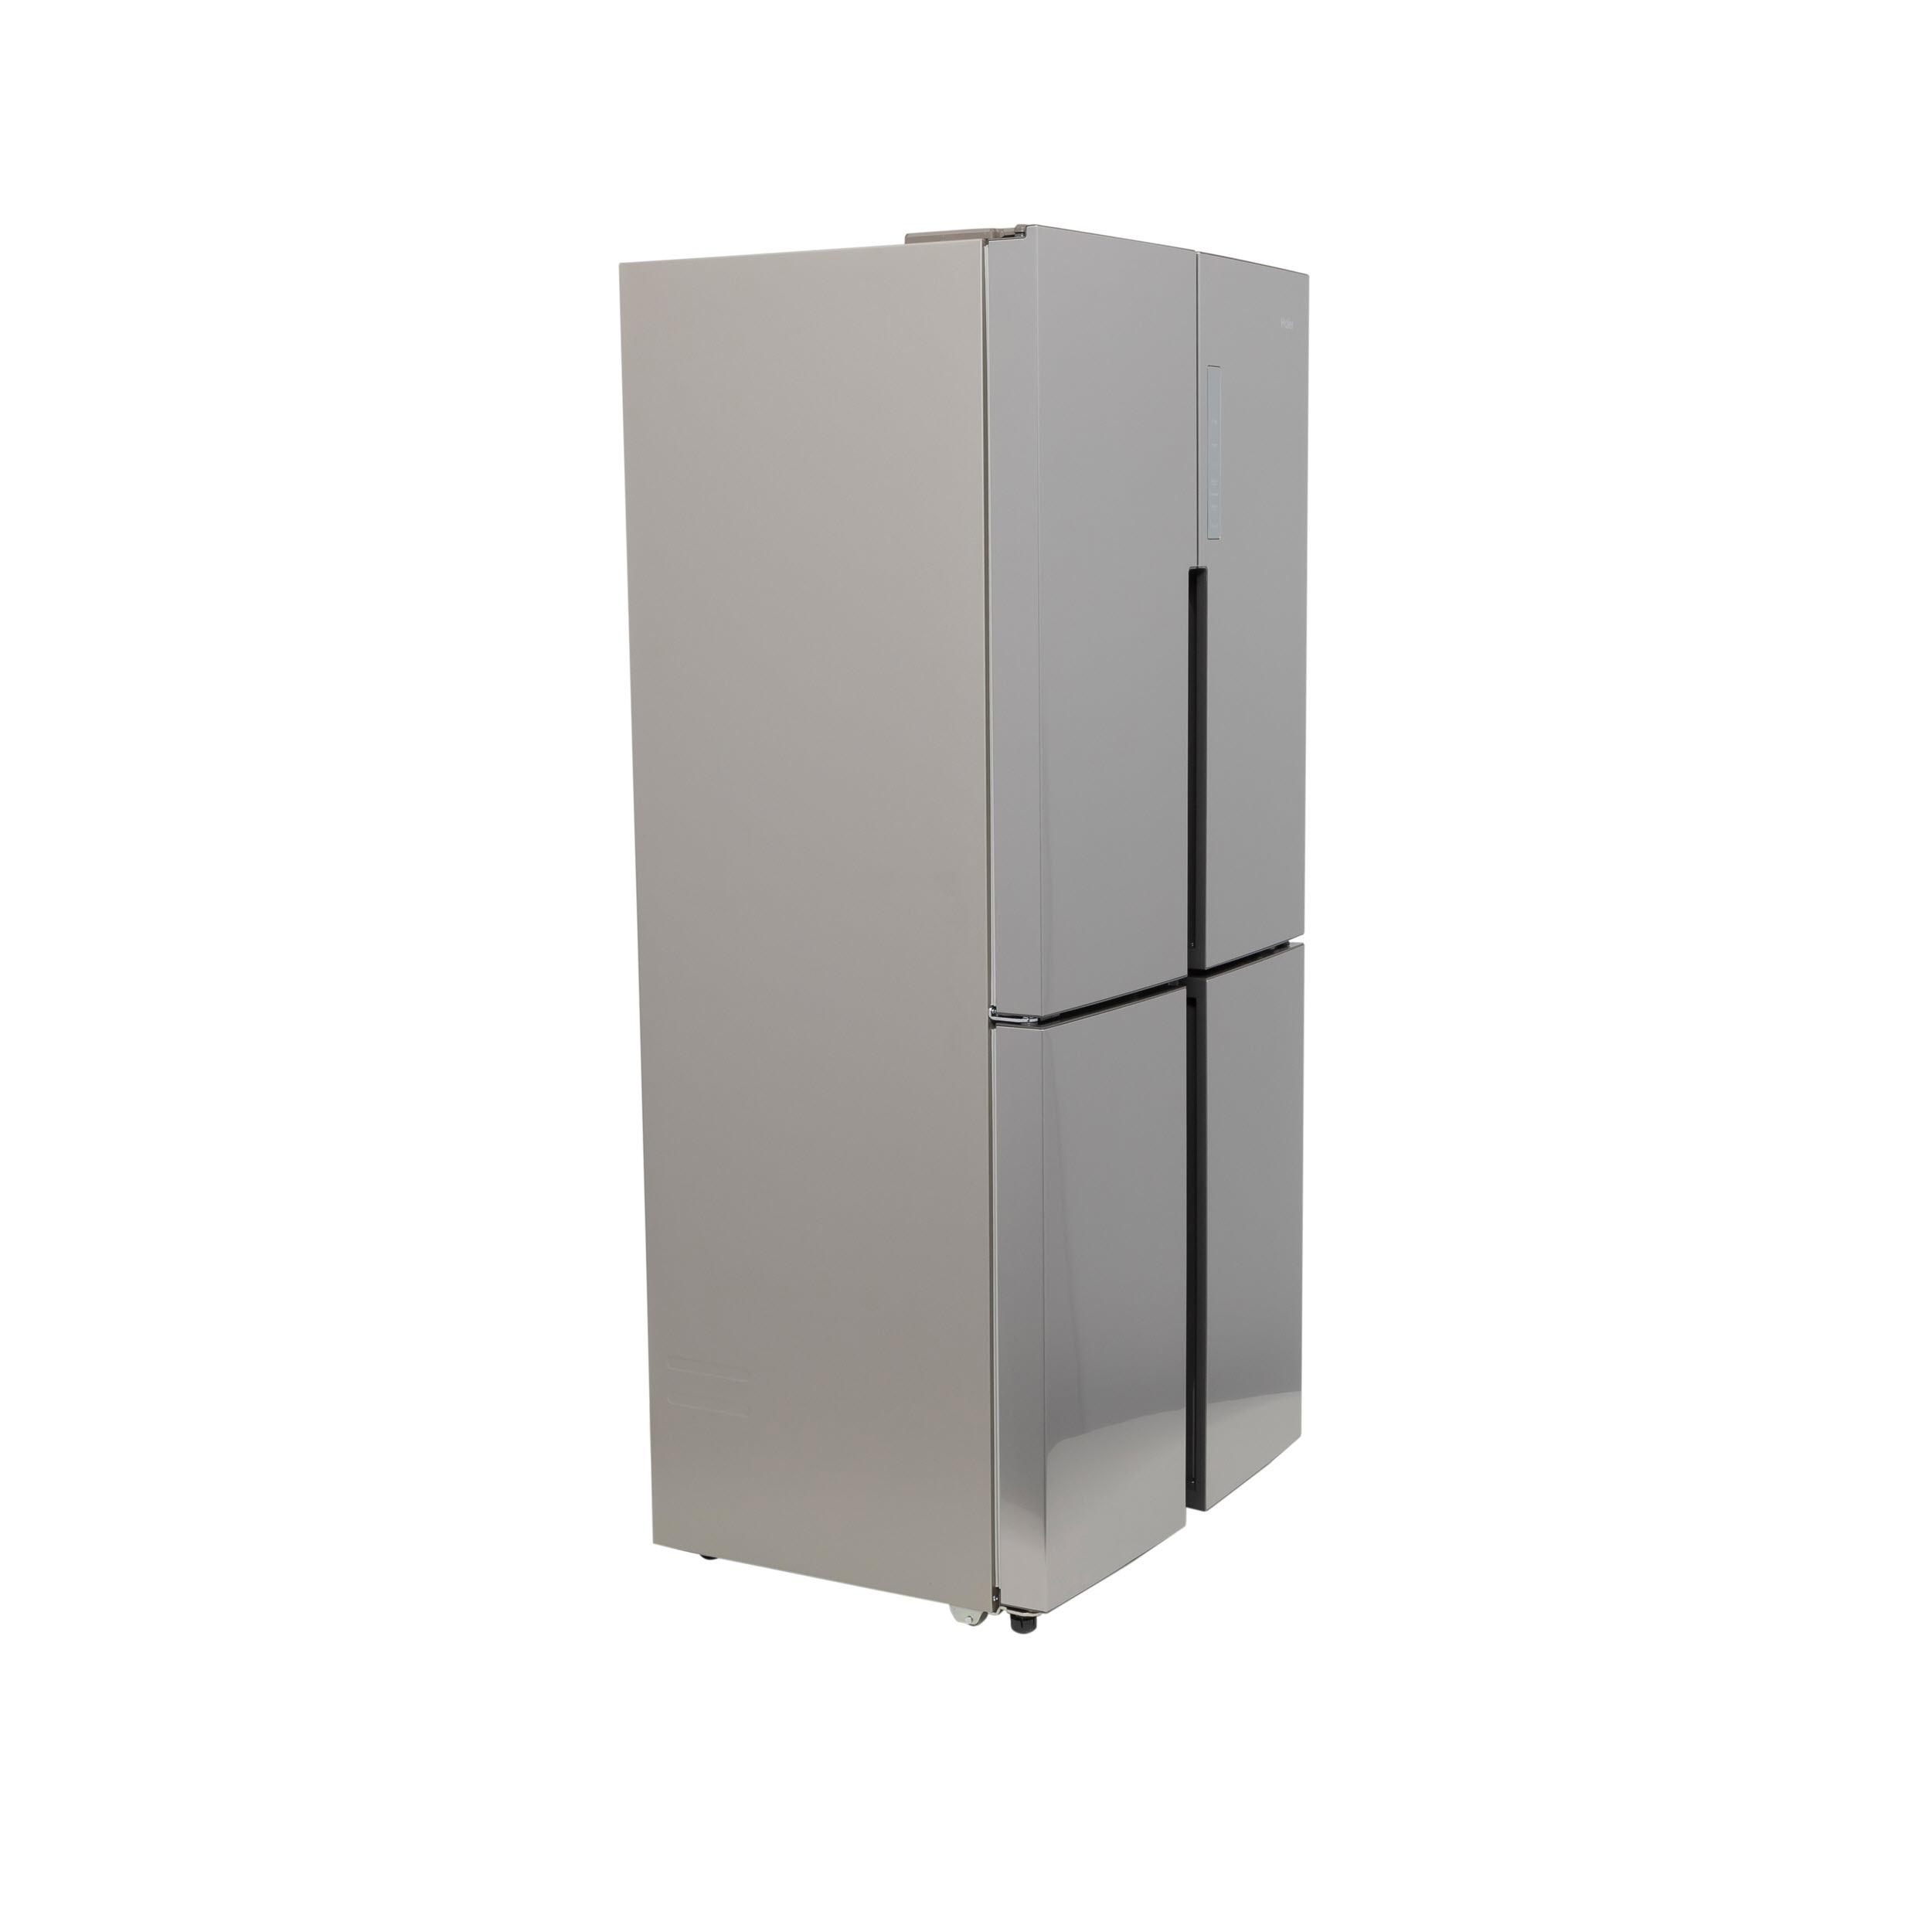 Model: QHE16HYPFS | Haier 16.4 Cu. Ft. Quad Door Refrigerator